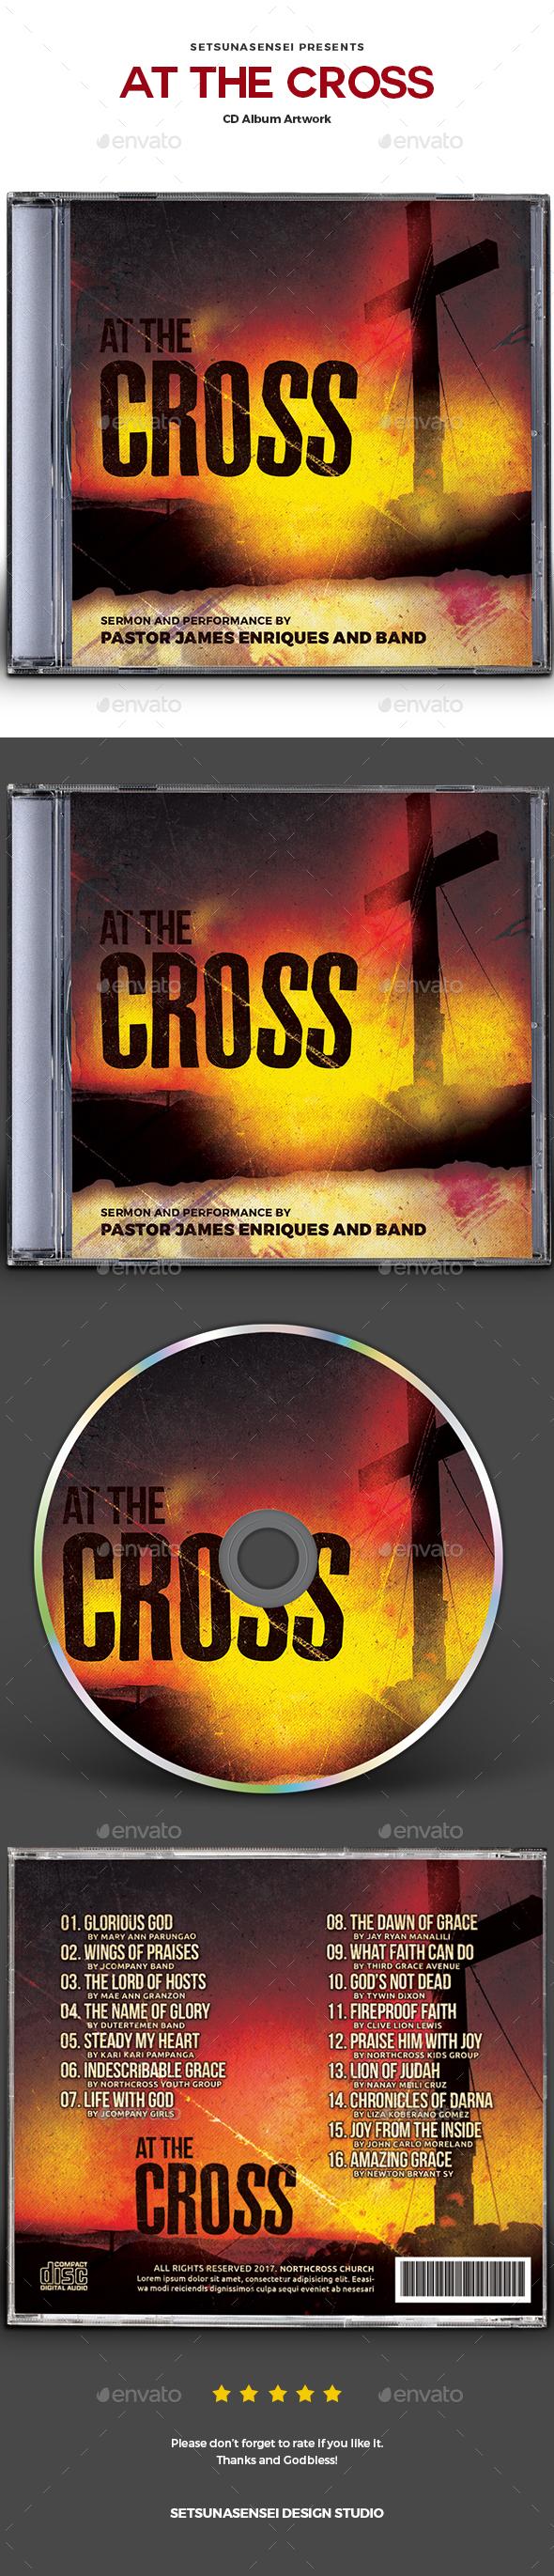 GraphicRiver At the Cross CD Album Artwork 20744465